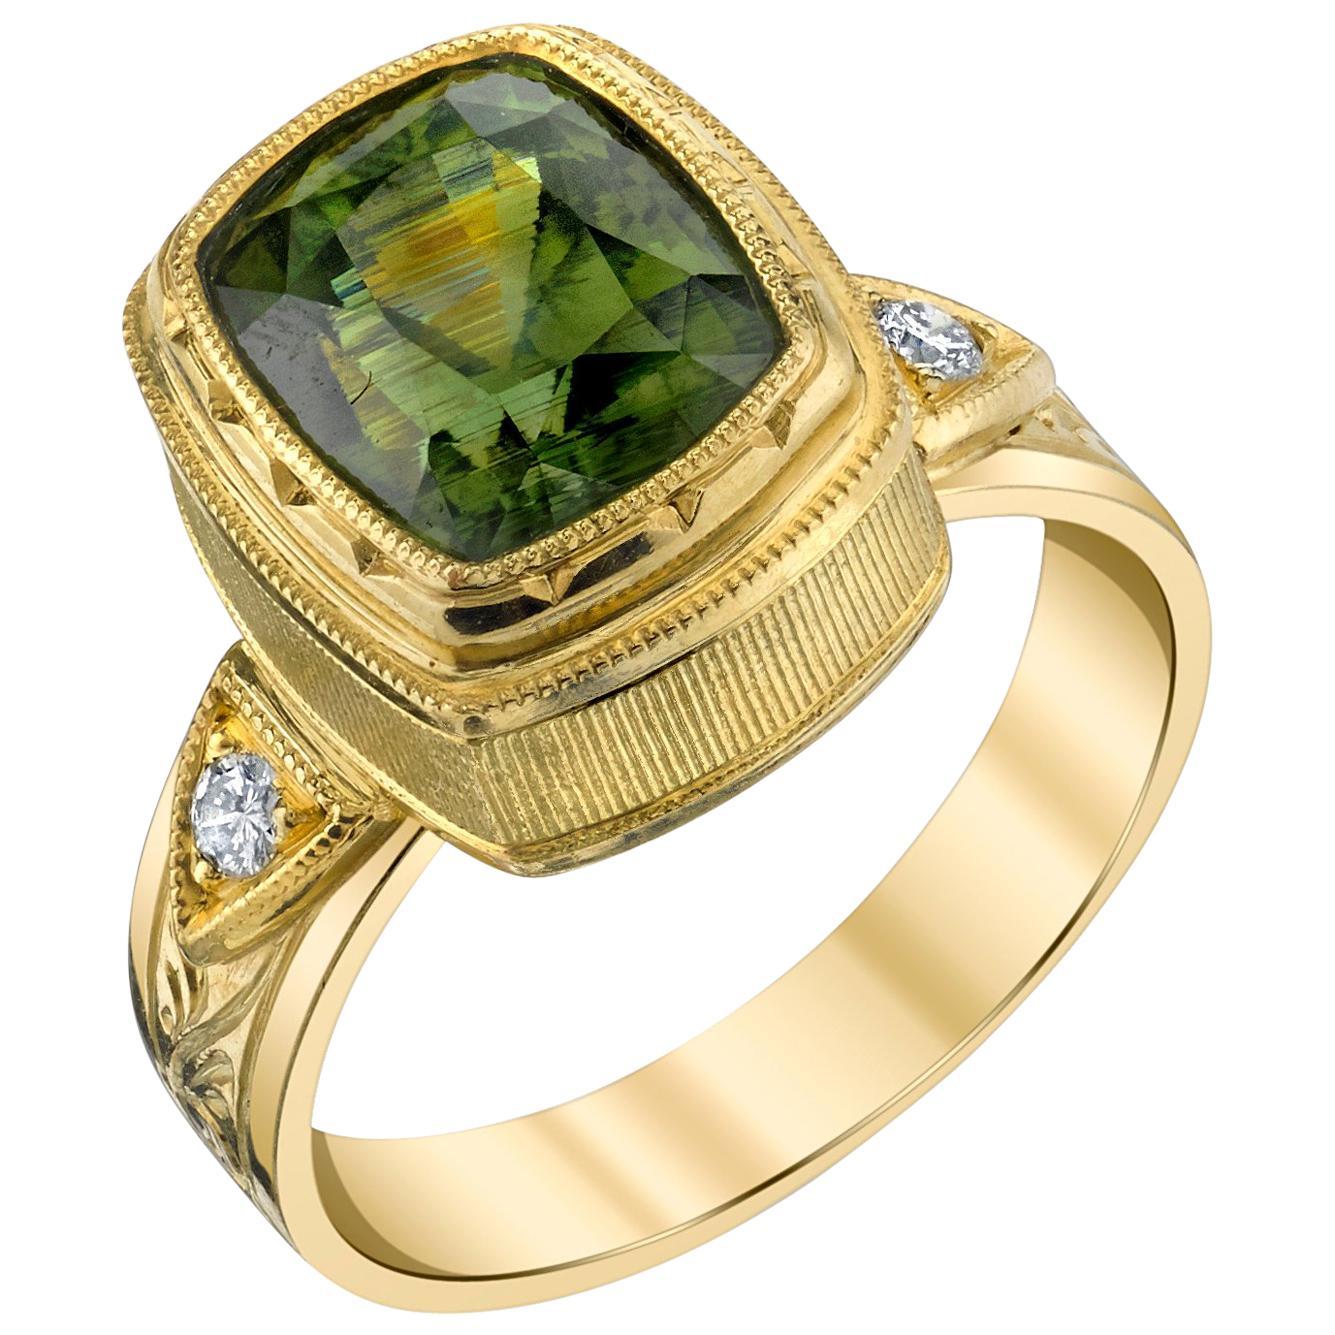 5.38 ct. Green Zircon Cushion, Diamond, Yellow Gold Bezel Engraved Band Ring